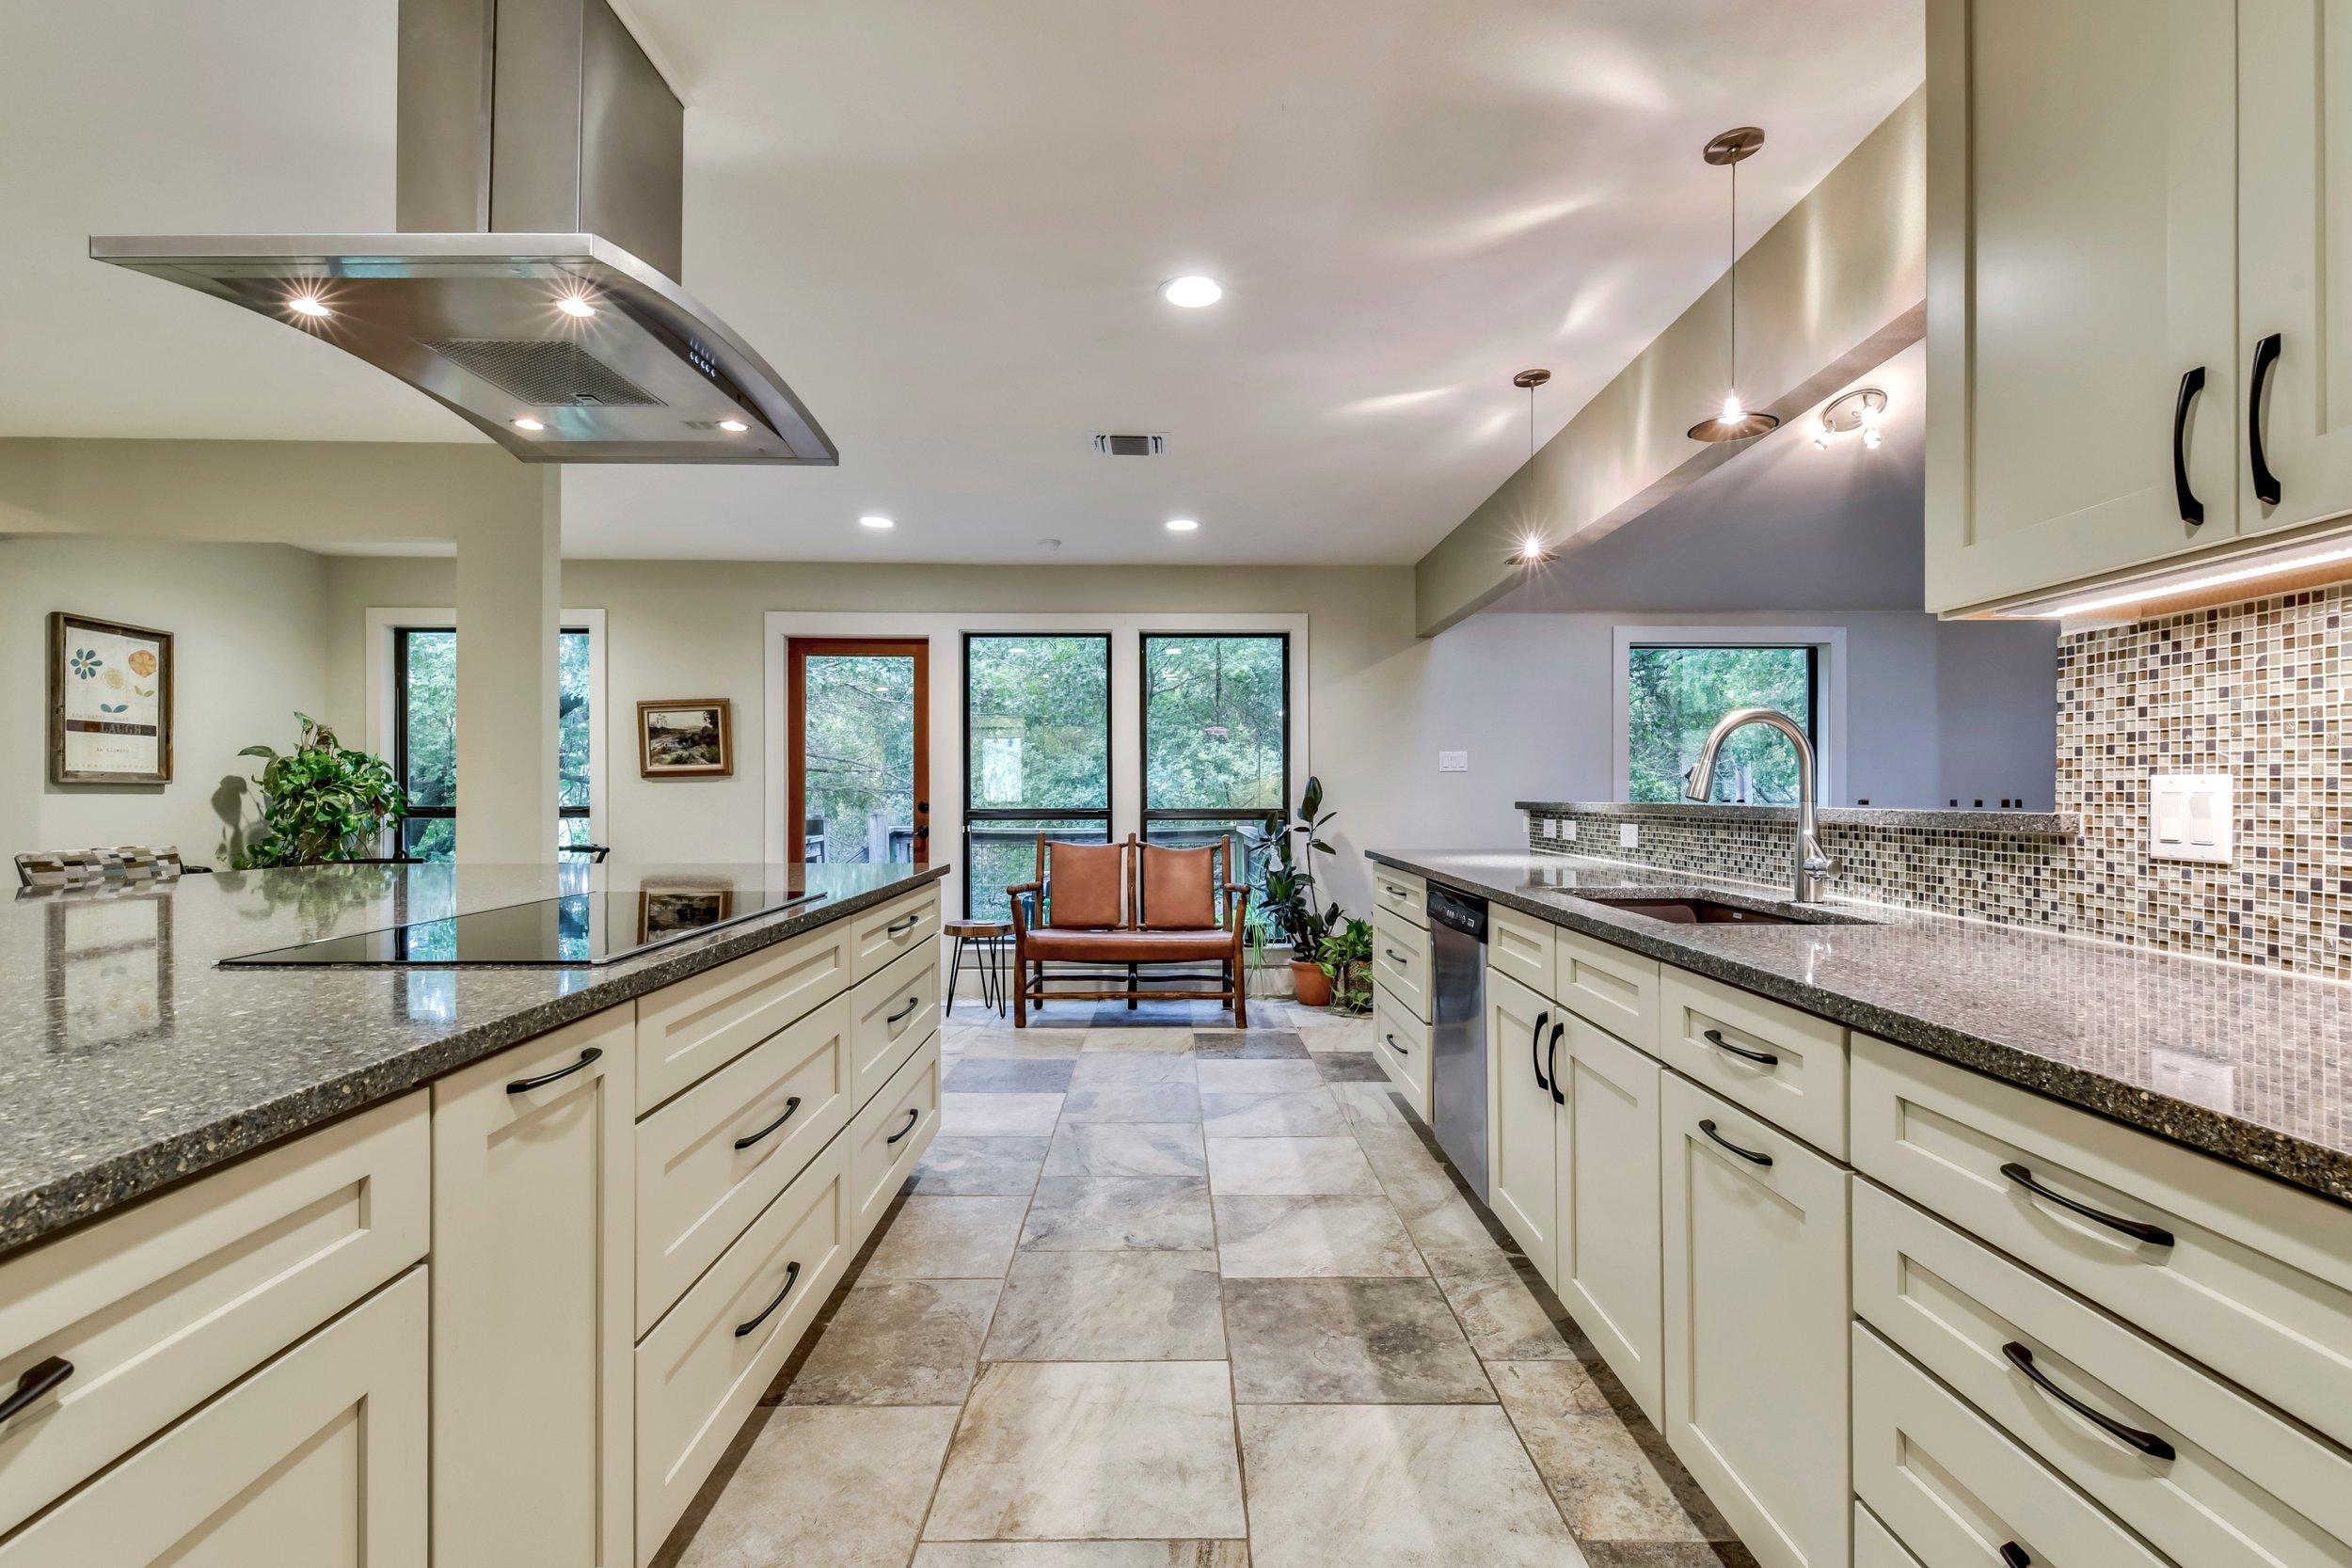 Kitchen Design Remodel with Granite Countertops